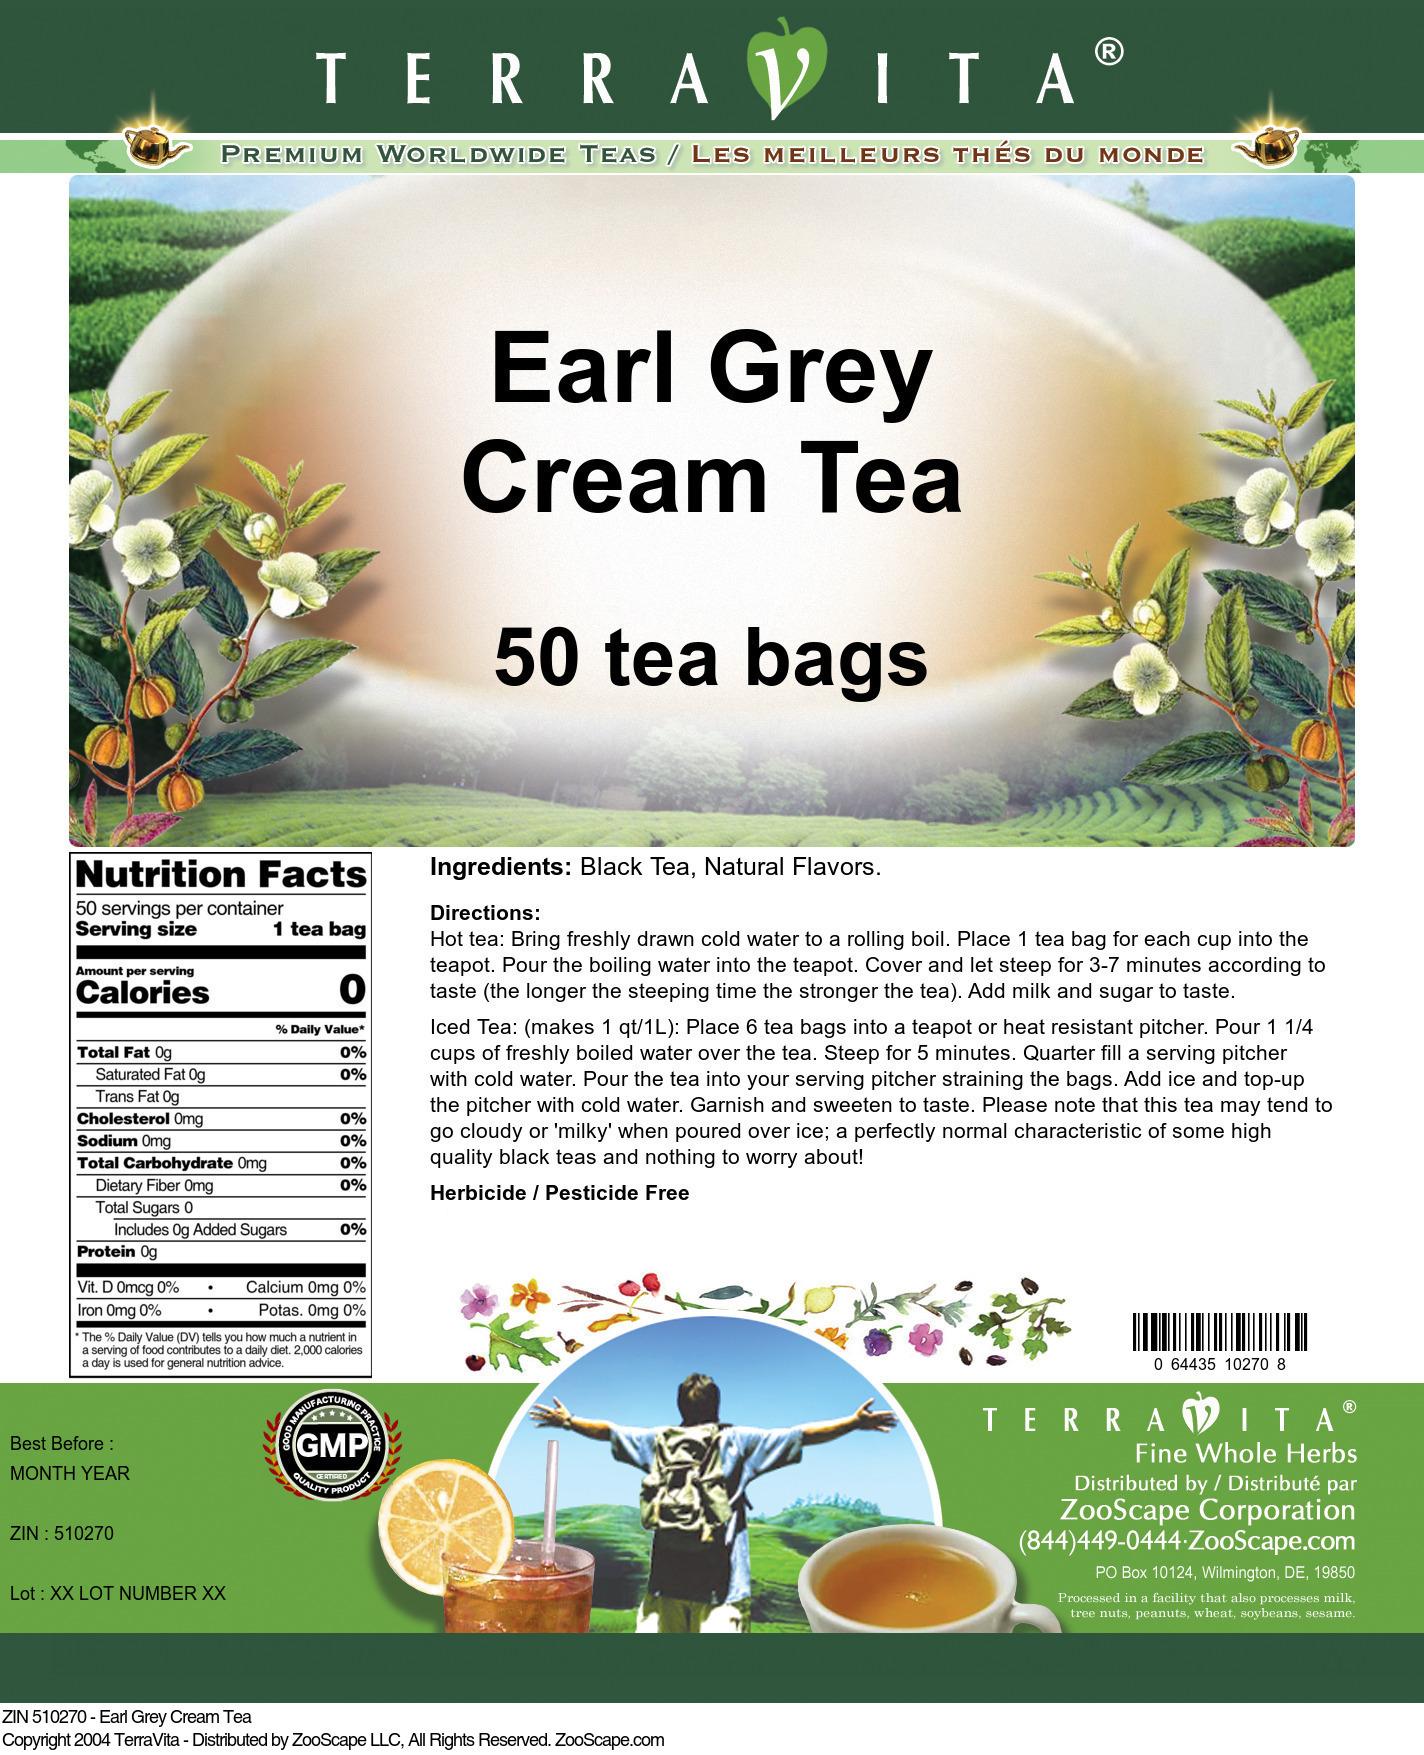 Earl Grey Cream Tea